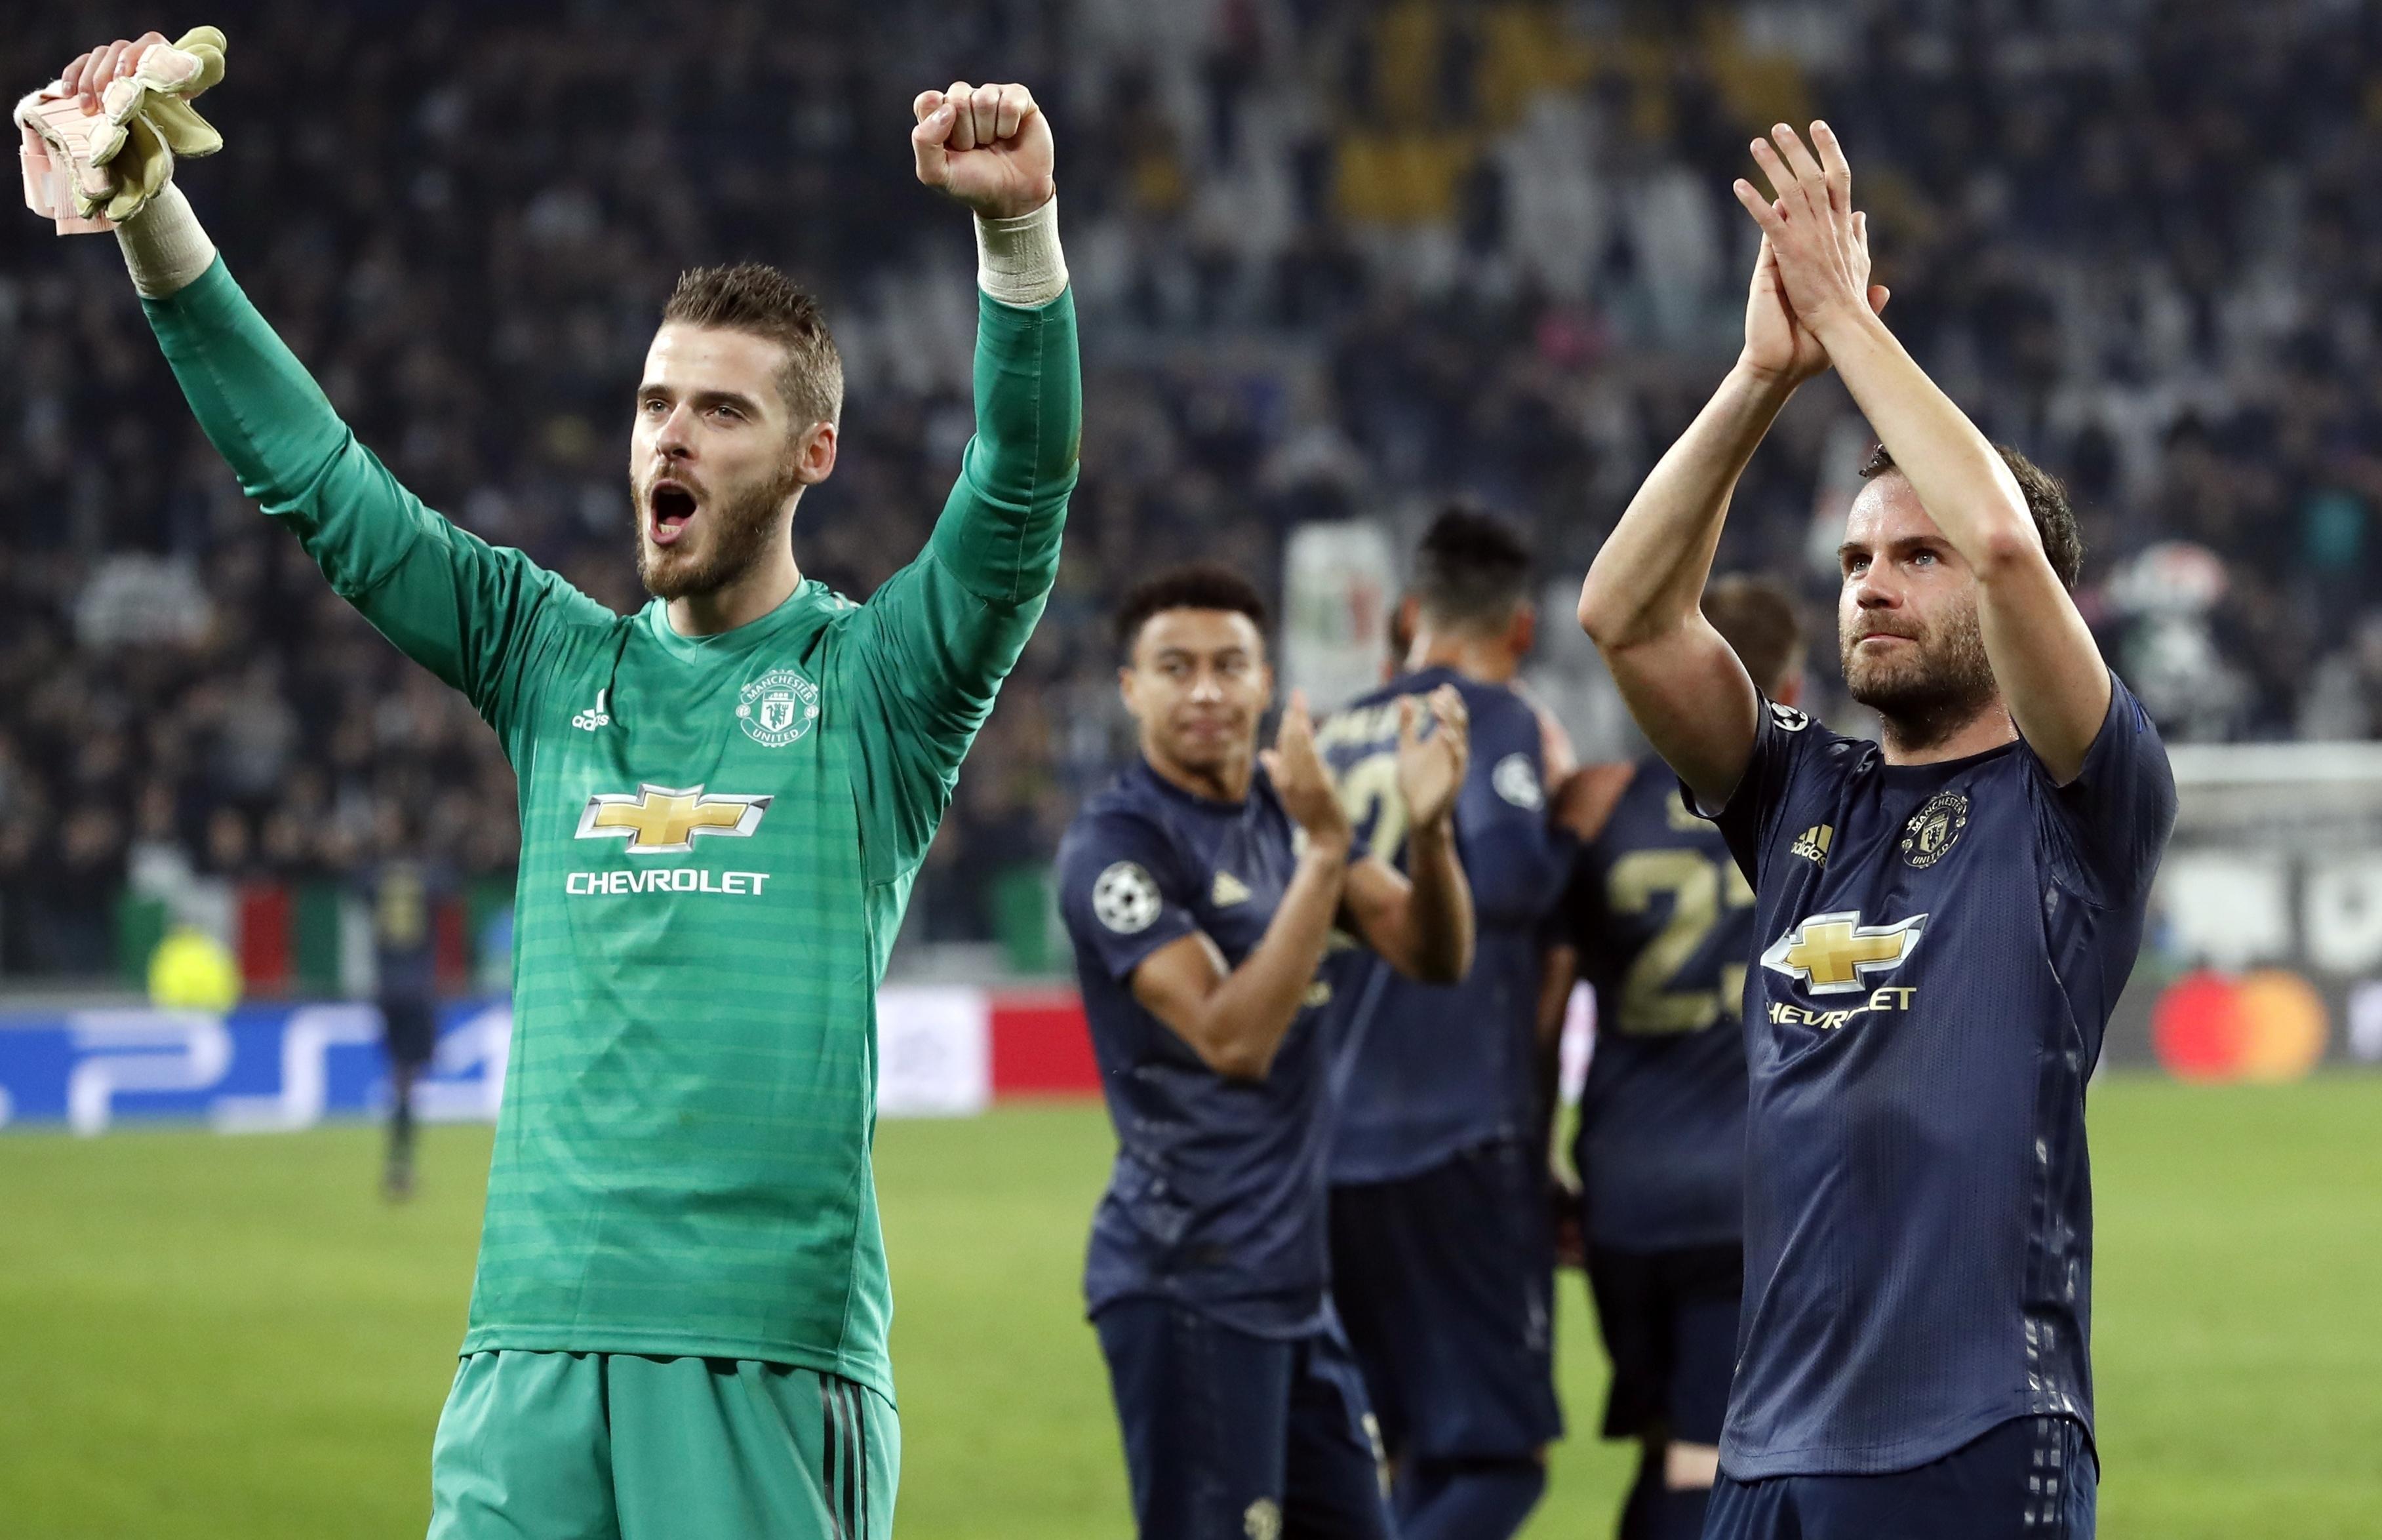 9691d5caa37 Manchester United goalkeeper David de Gea, left, and Juan Mata celebrate at  the end